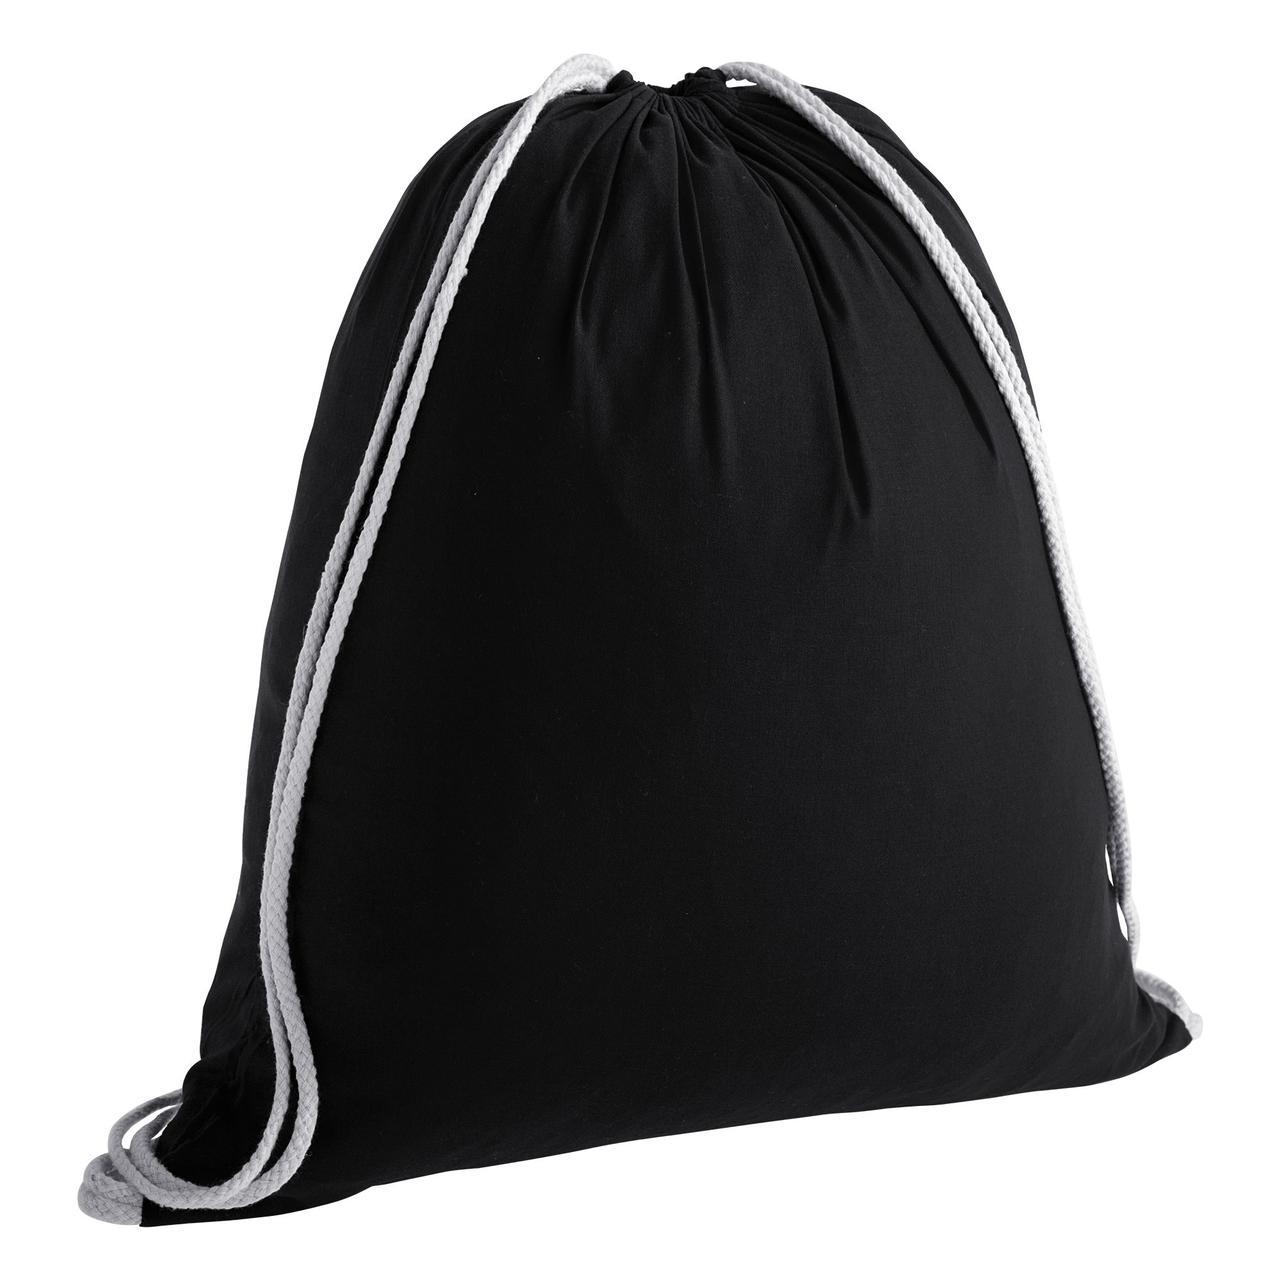 Рюкзак Canvas, черный (артикул 5449.30)